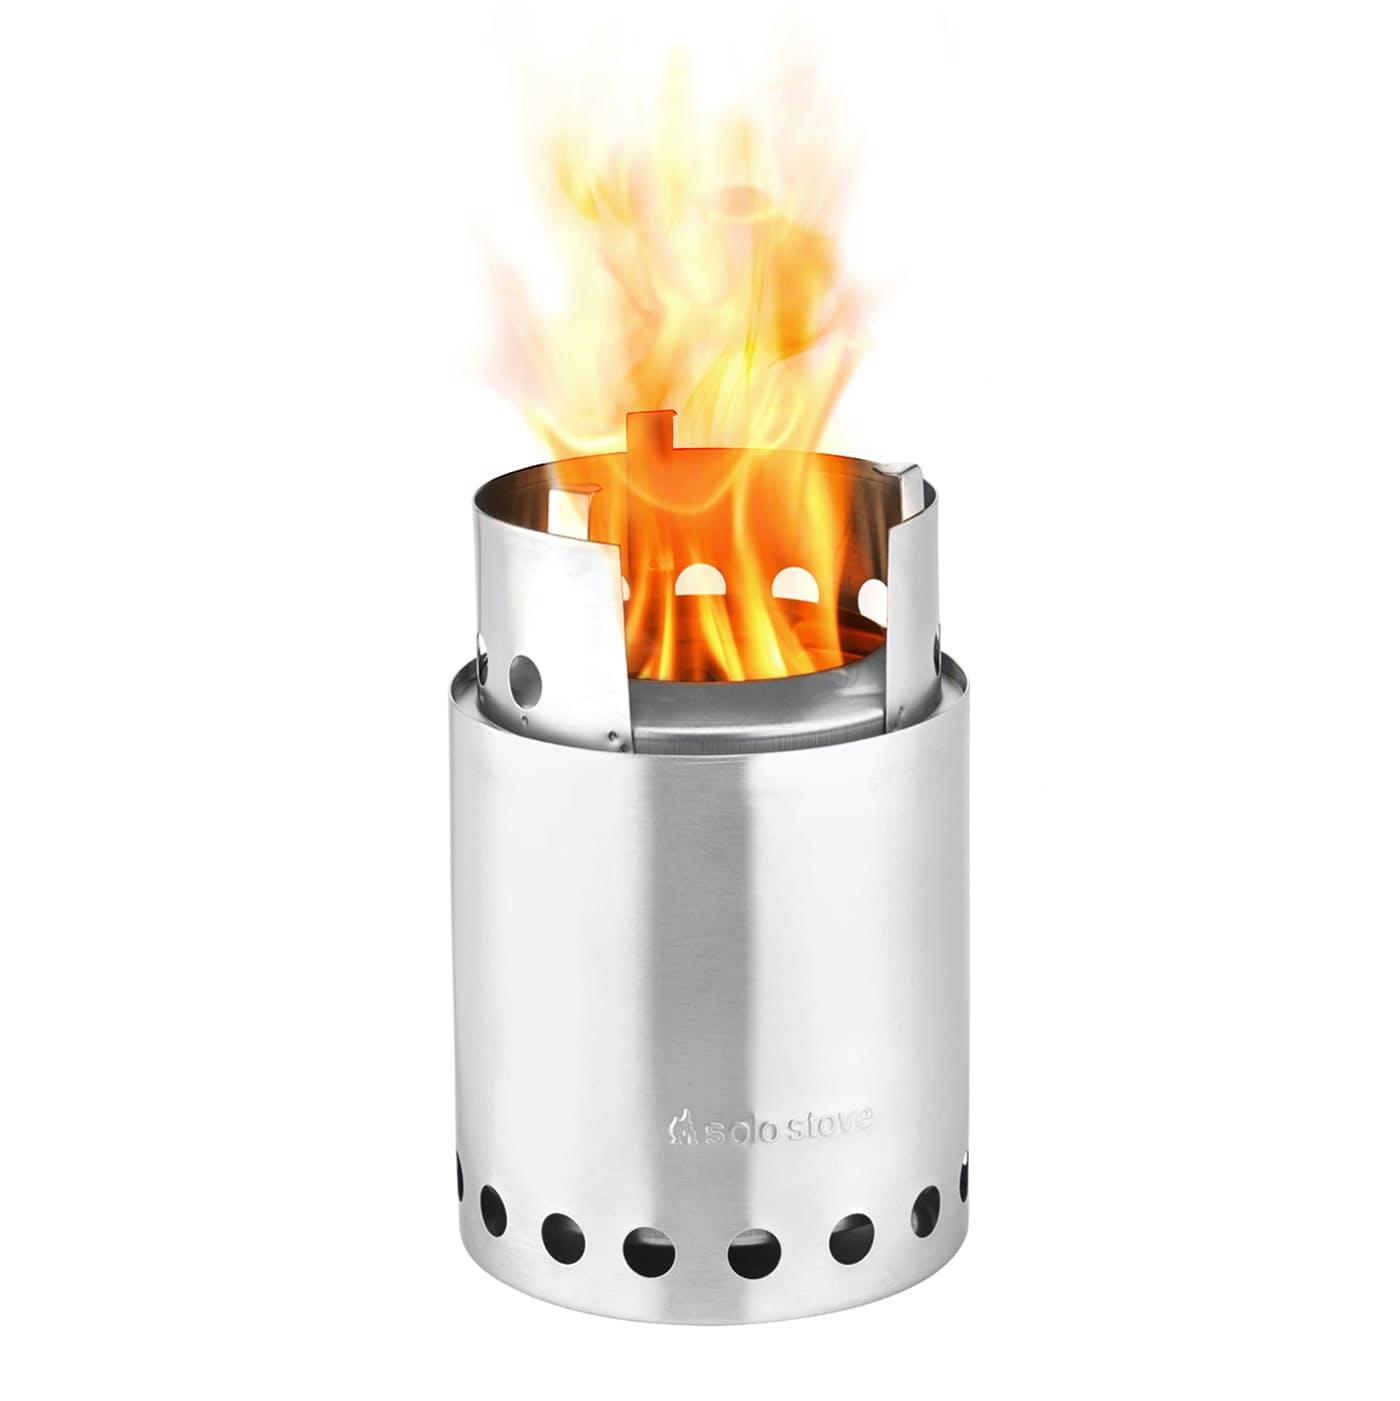 Bsyx8kilvx solo stove titan lightweight 2p stove 0 original